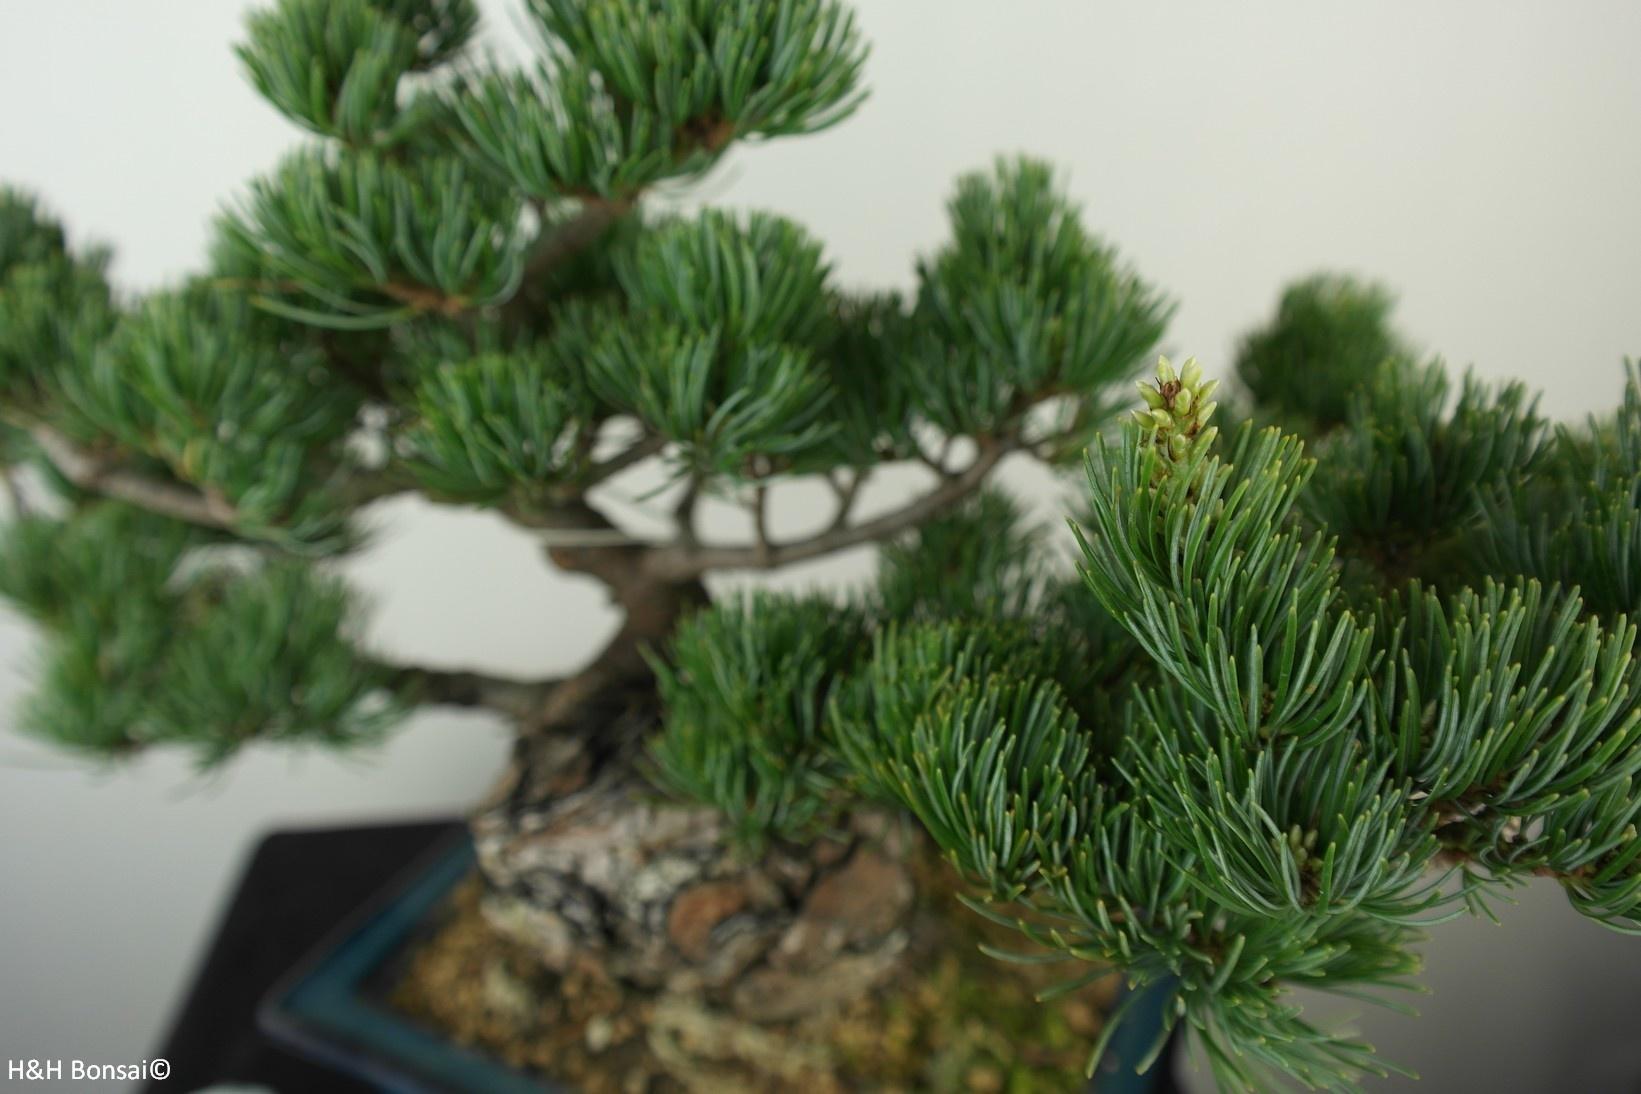 Bonsai Pinus pentaphylla, Japanse witte den, nr. 7804